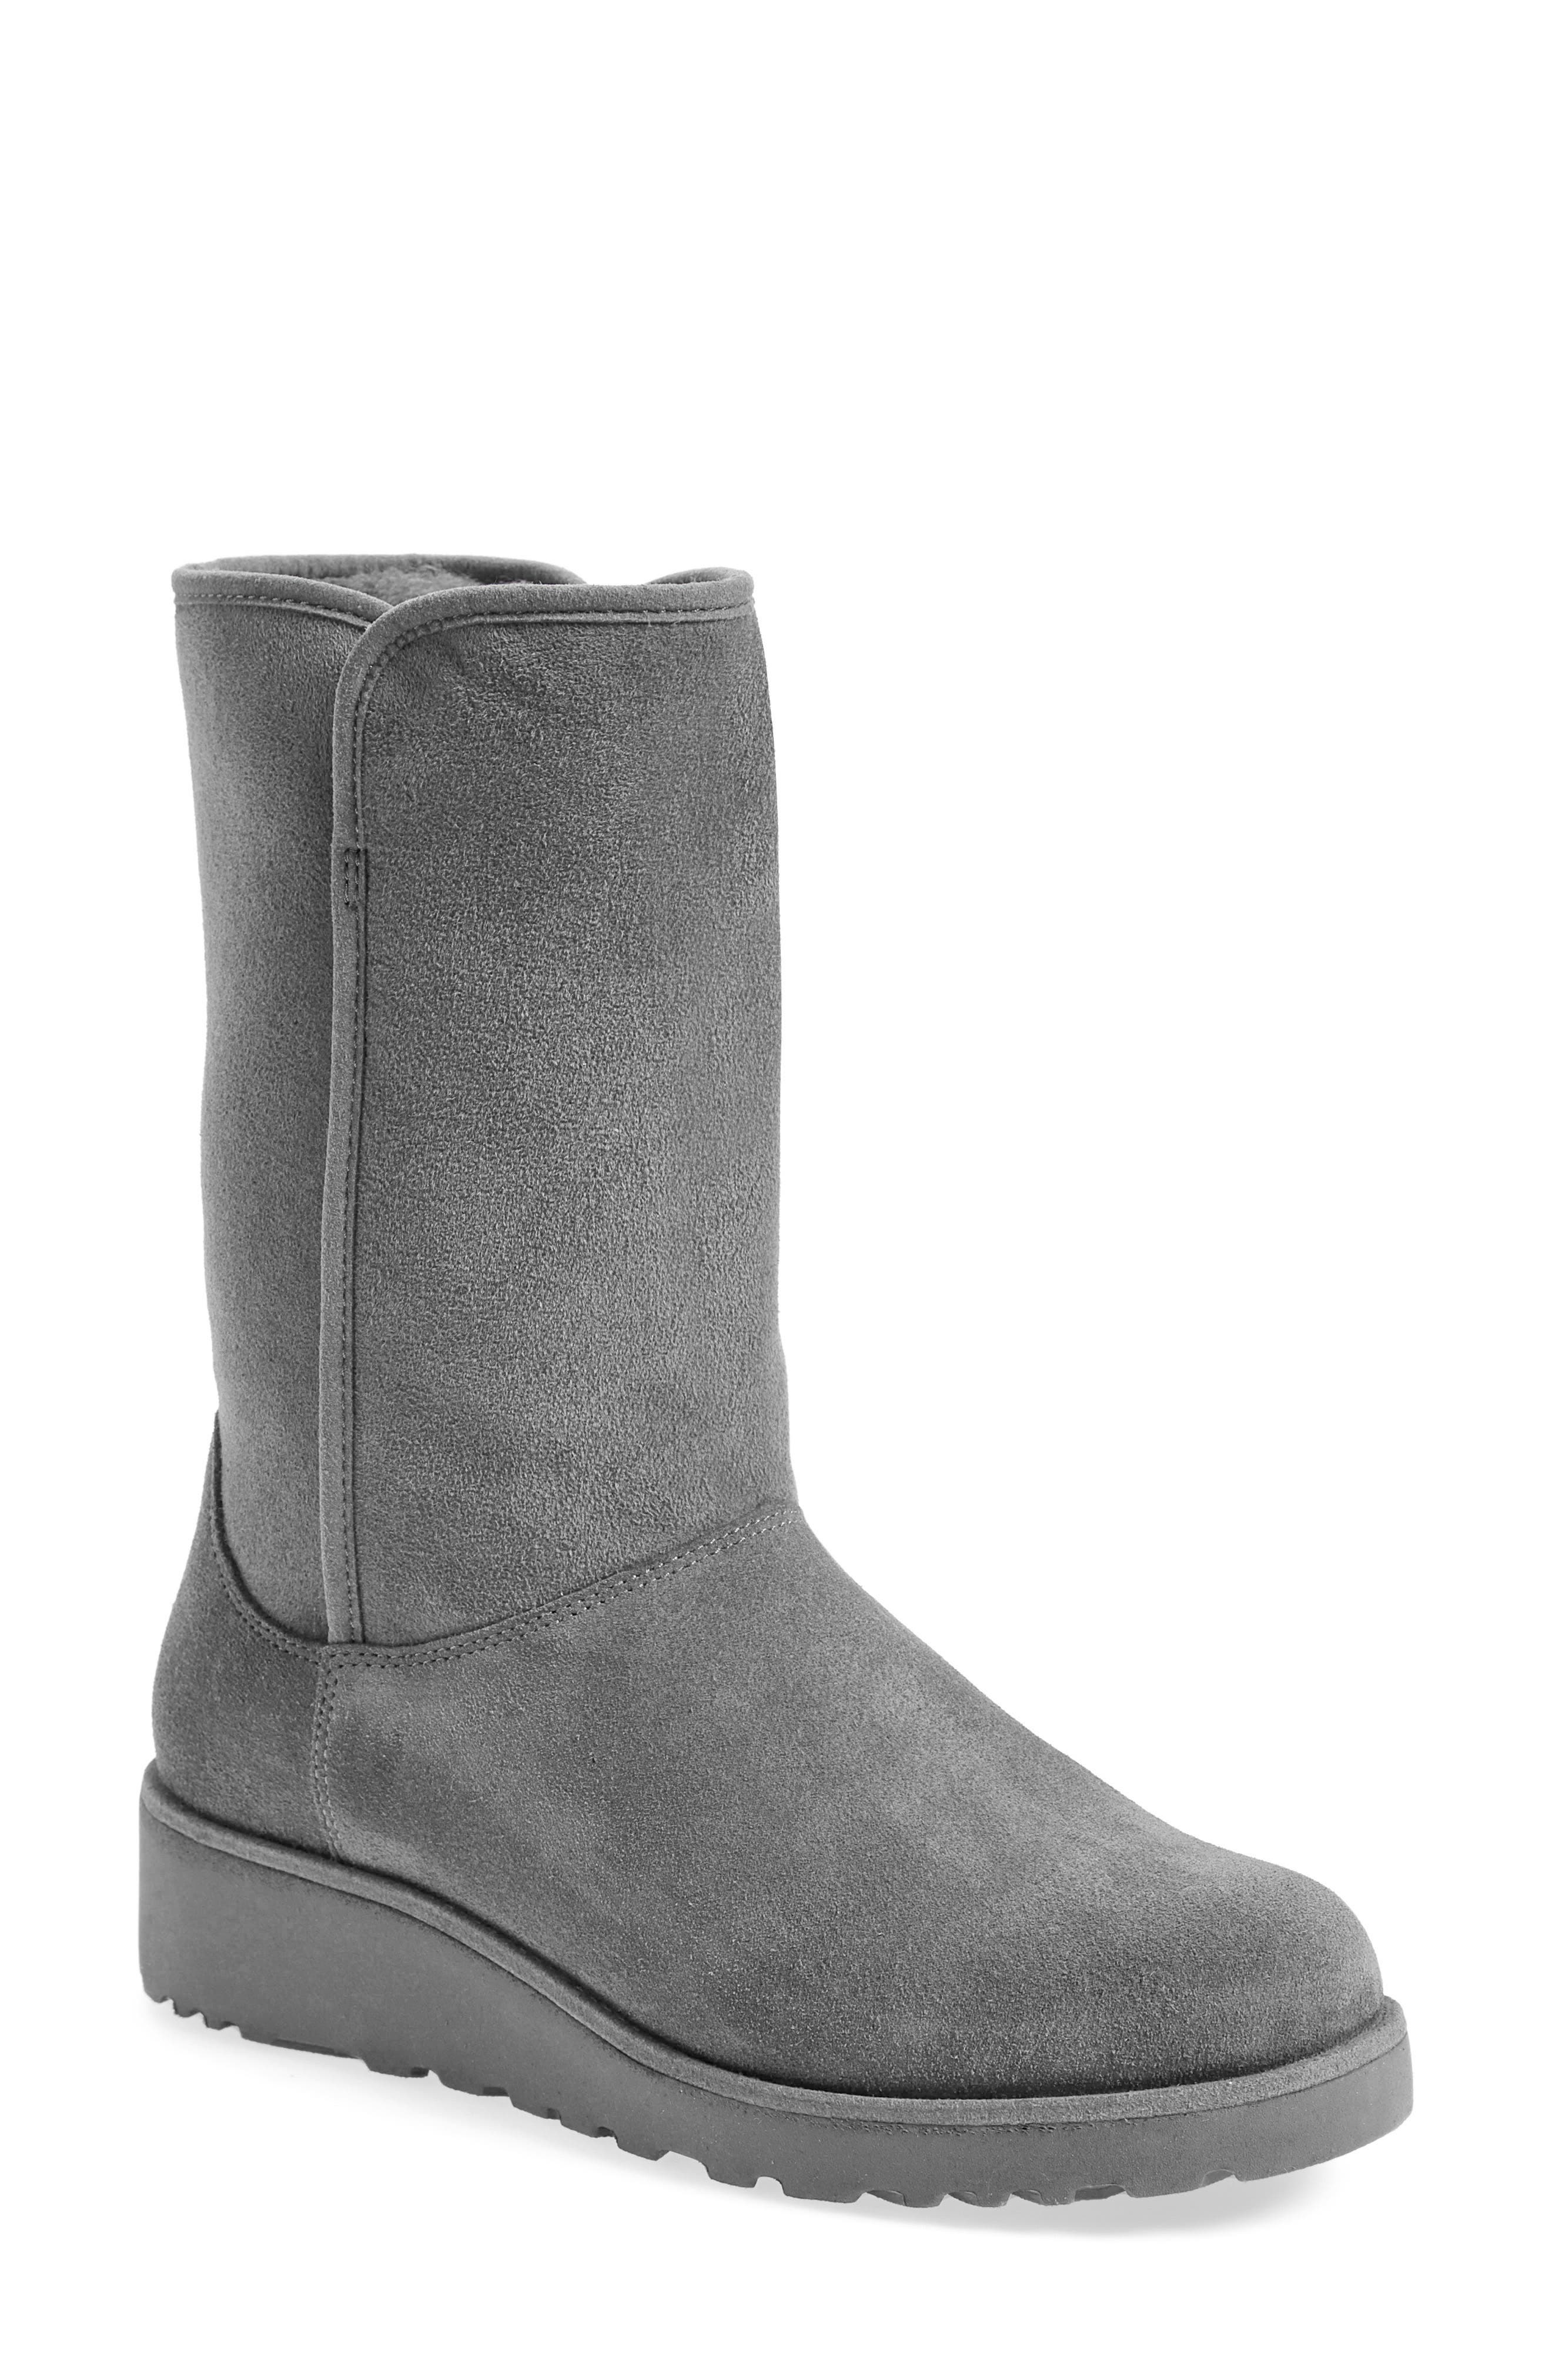 Main Image - UGG® Amie - Classic Slim™ Water Resistant Short Boot (Women)